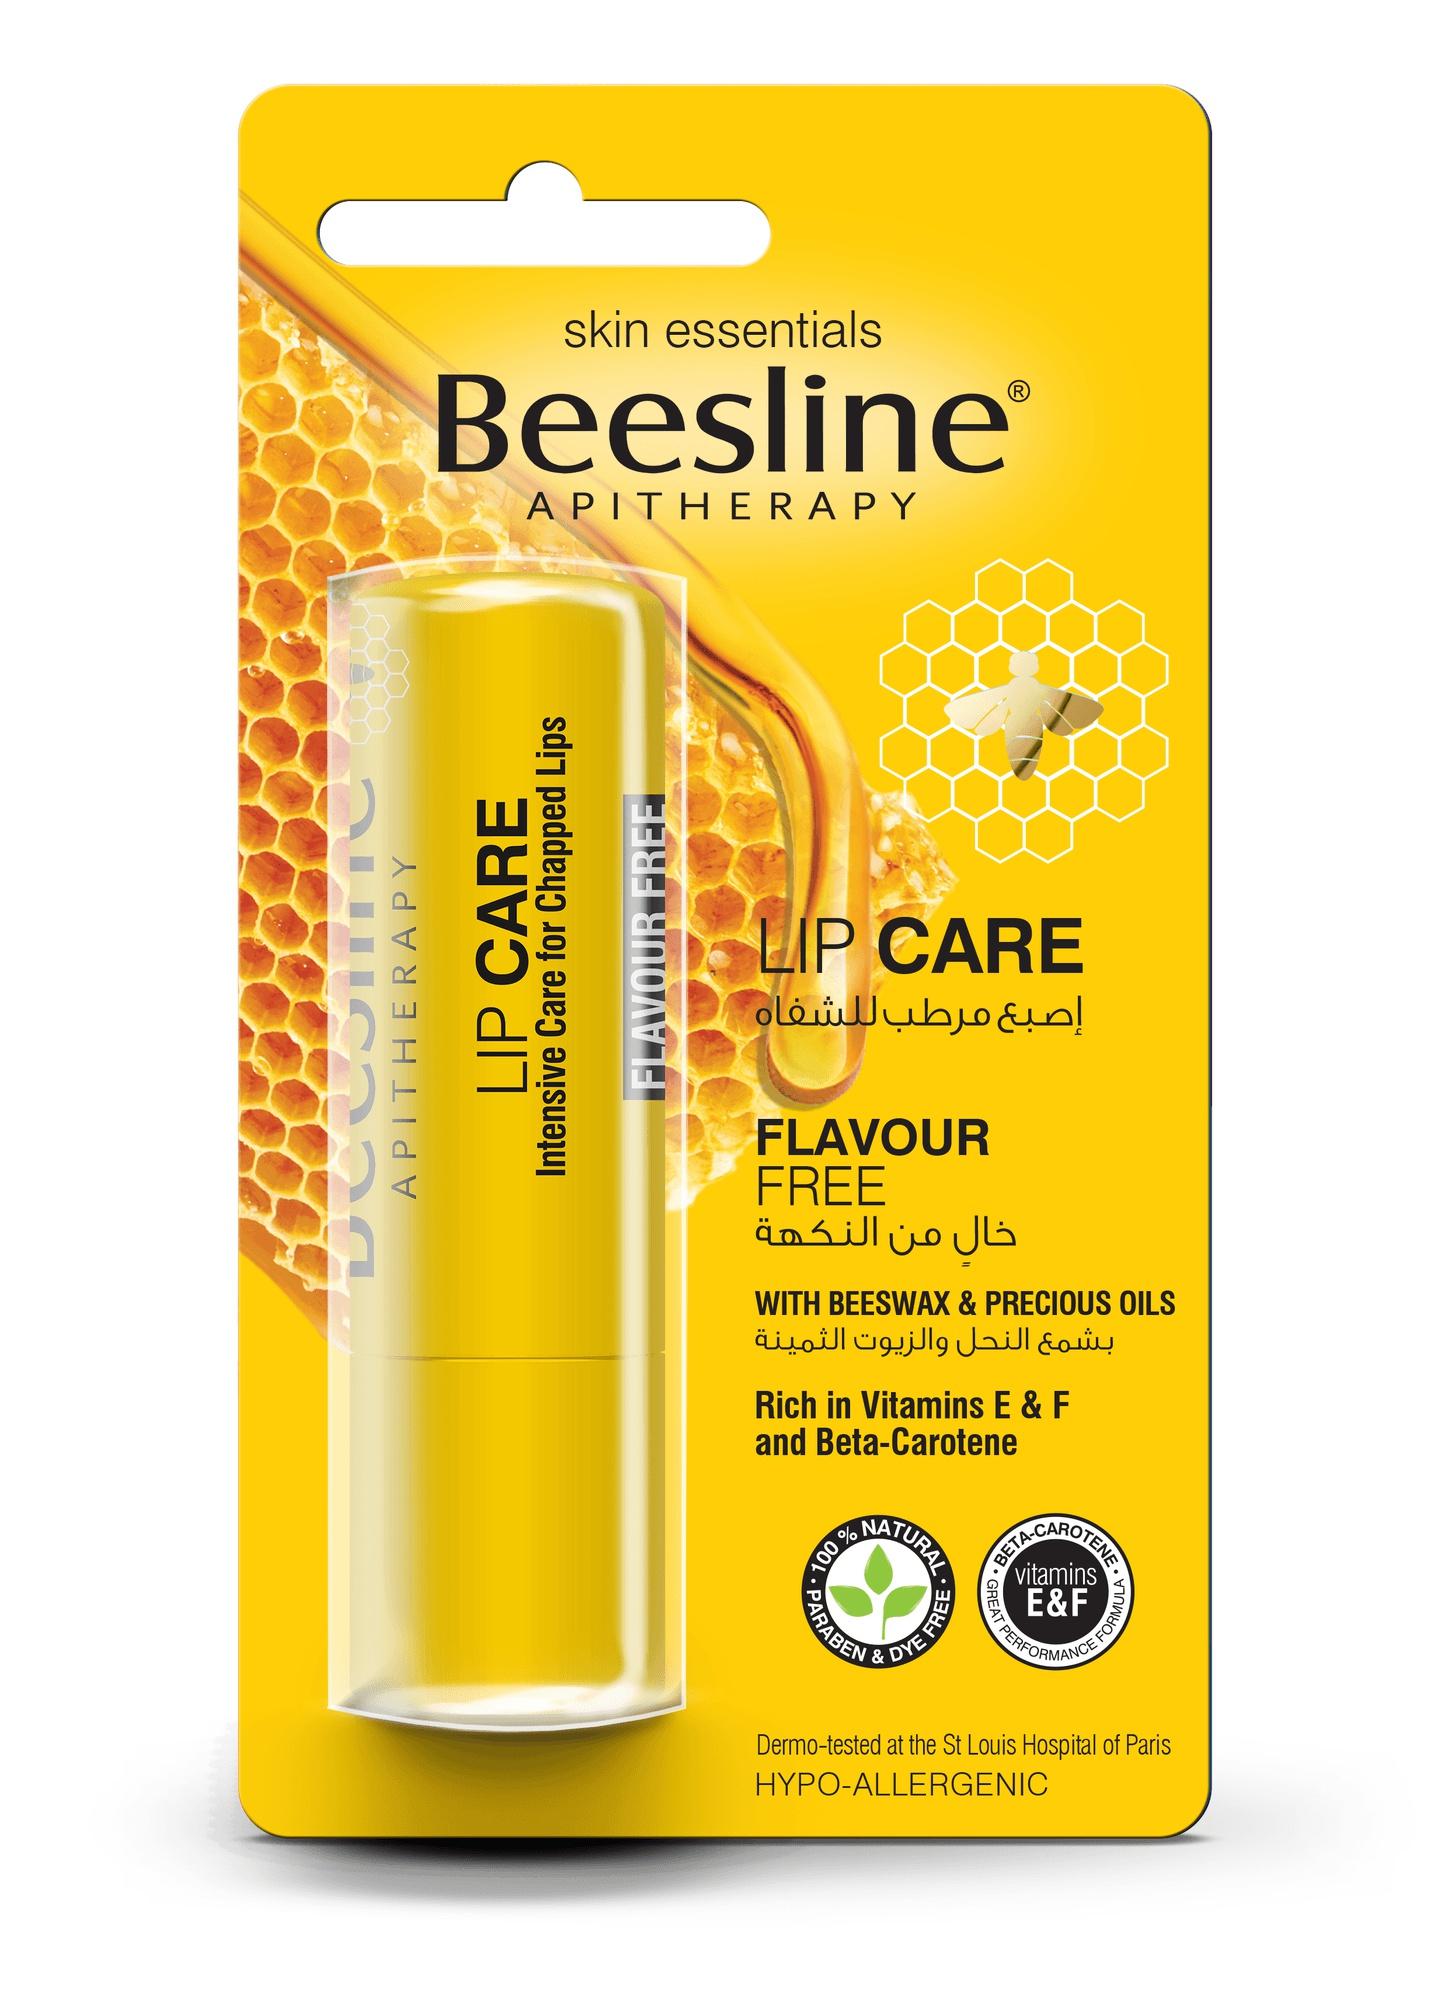 Beesline Apitherapy Lip Balm Sunscreen